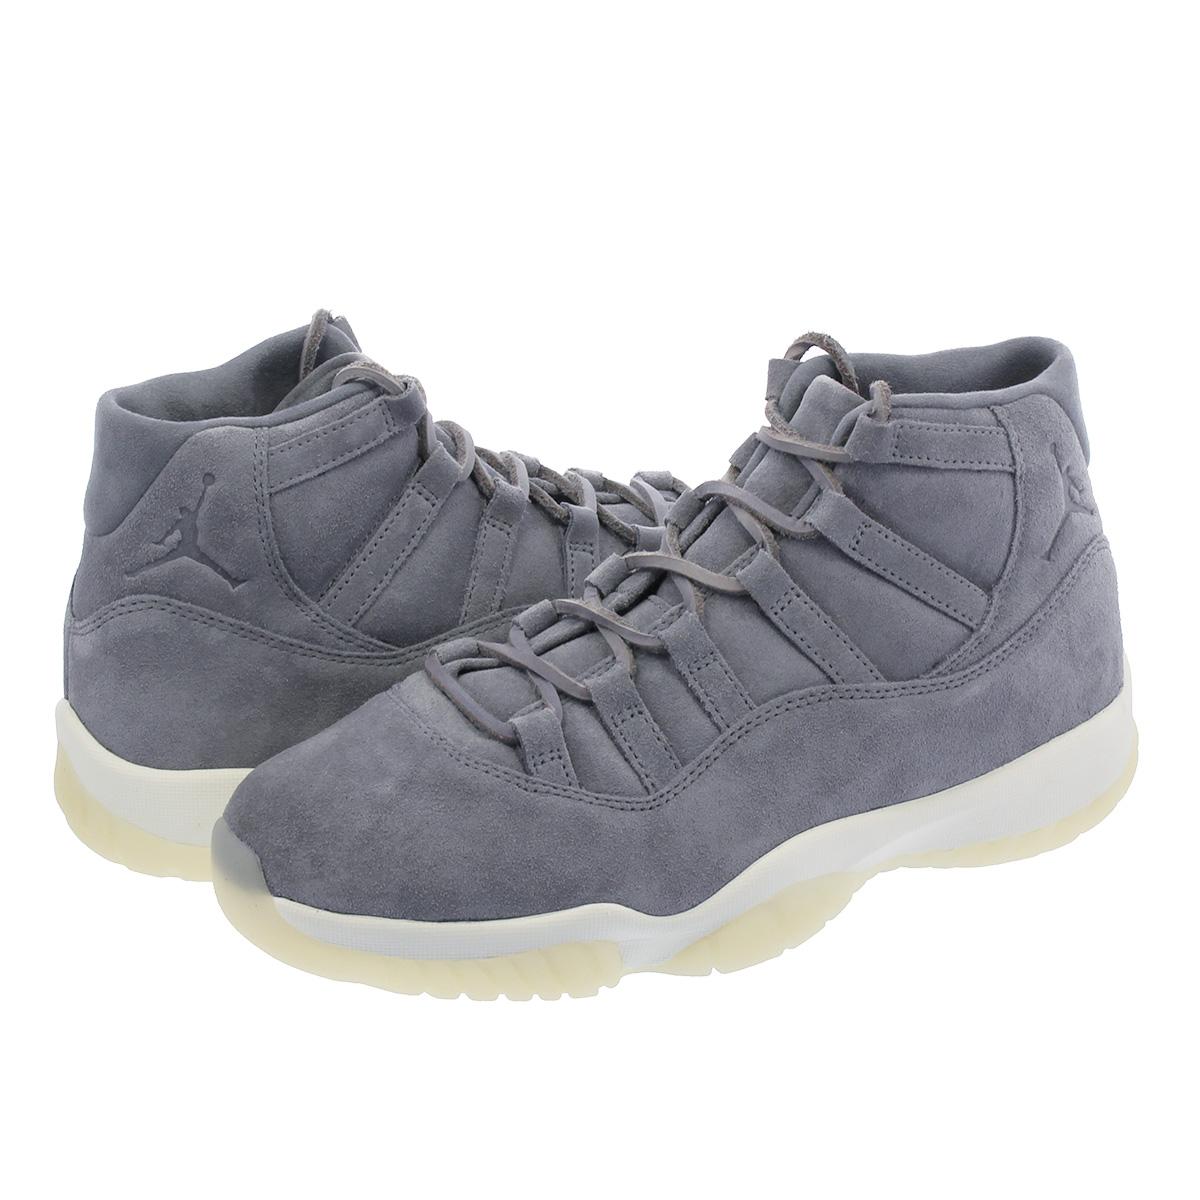 NIKE AIR JORDAN 11 RETRO PRM Nike Air Jordan 11 nostalgic premium COOL GREY  SAIL 914 f931a355c